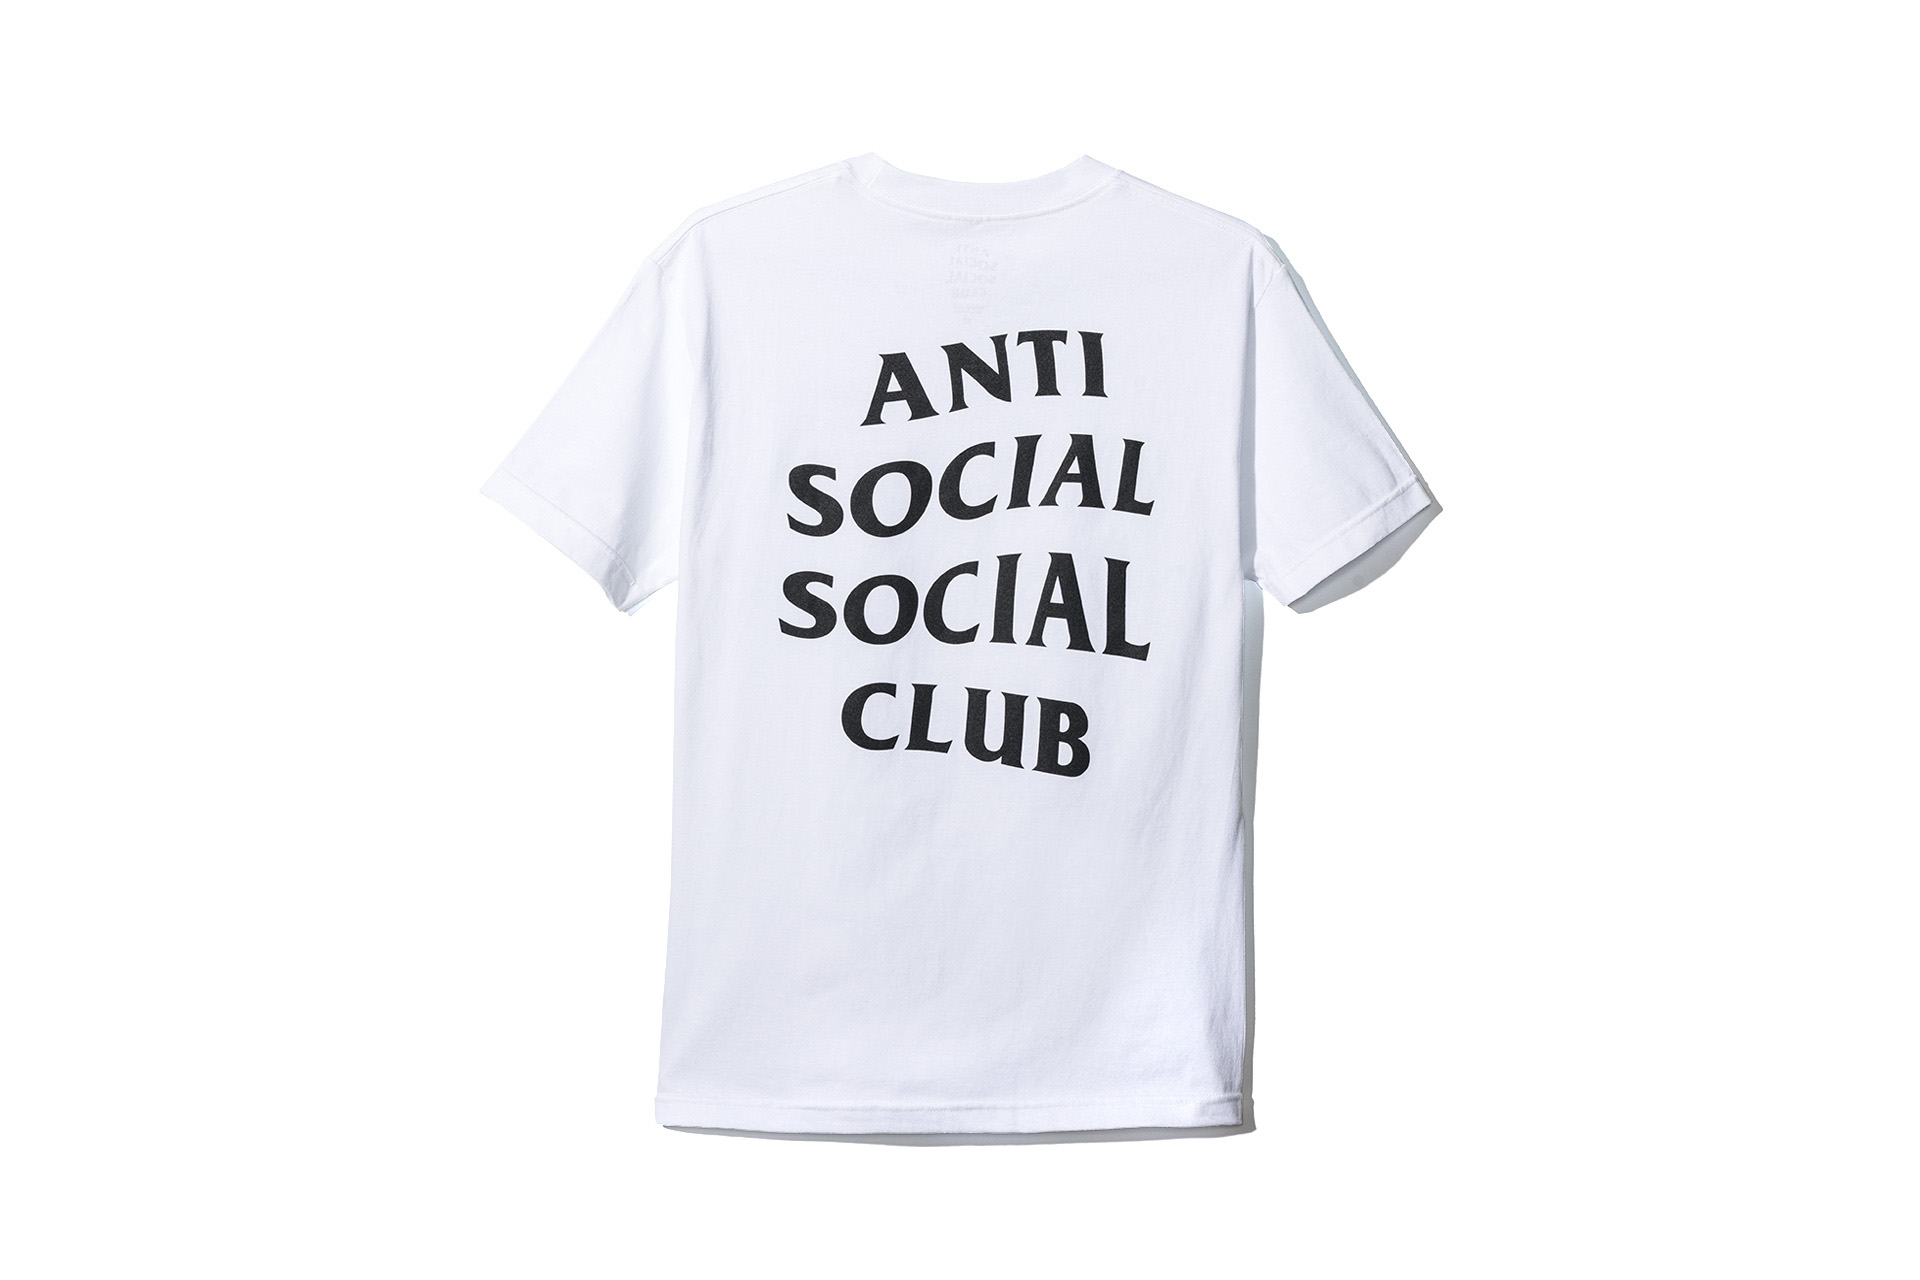 Anti Social Social Club 2017 Spring Summer - 3744347